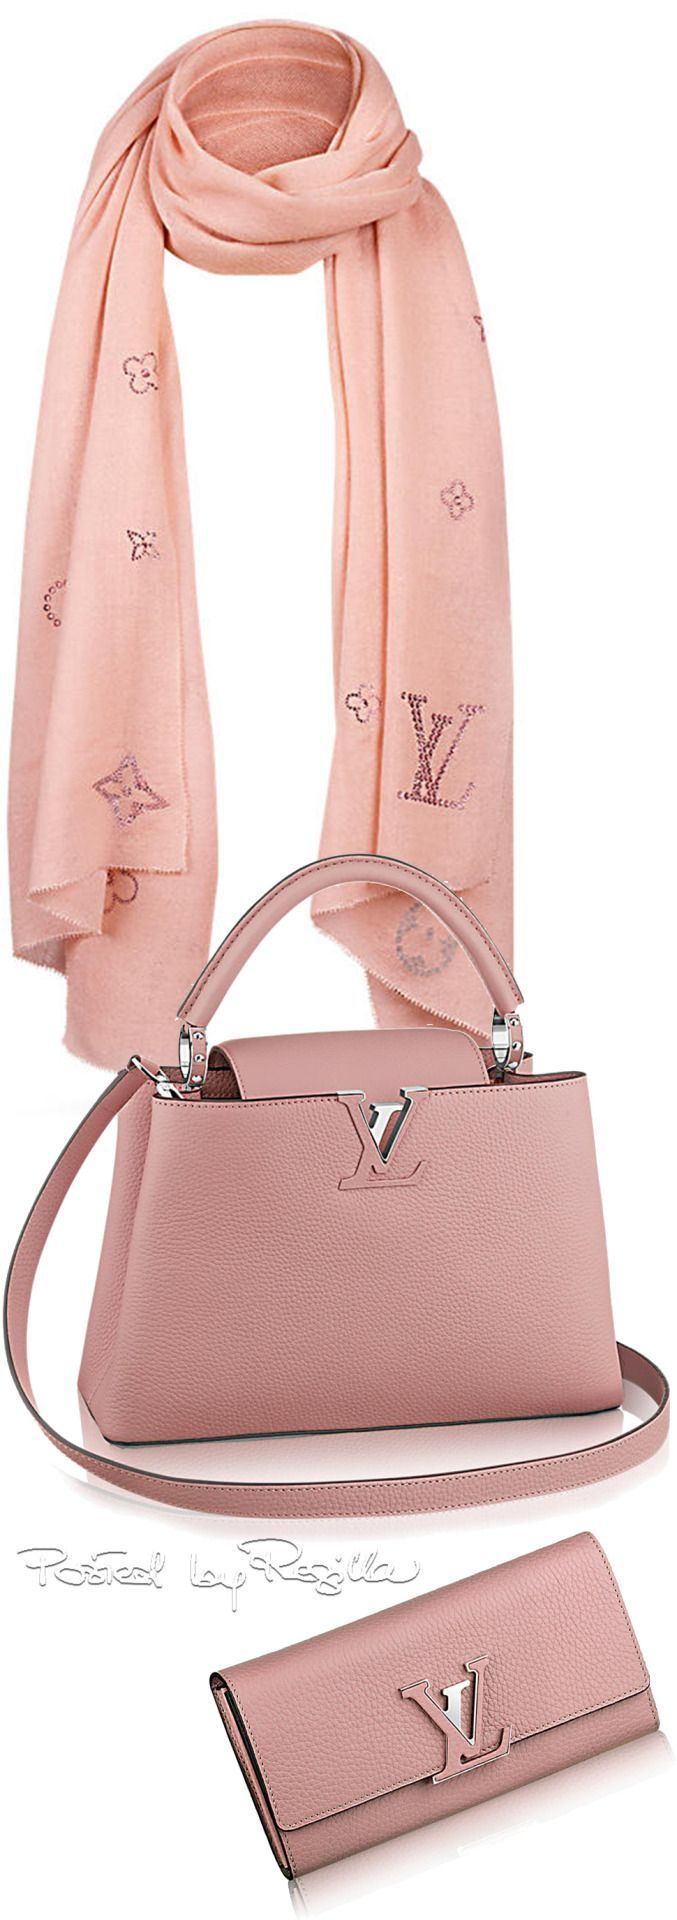 Regilla ⚜ Louis Vuitton:                                                                                                                                                                                 More